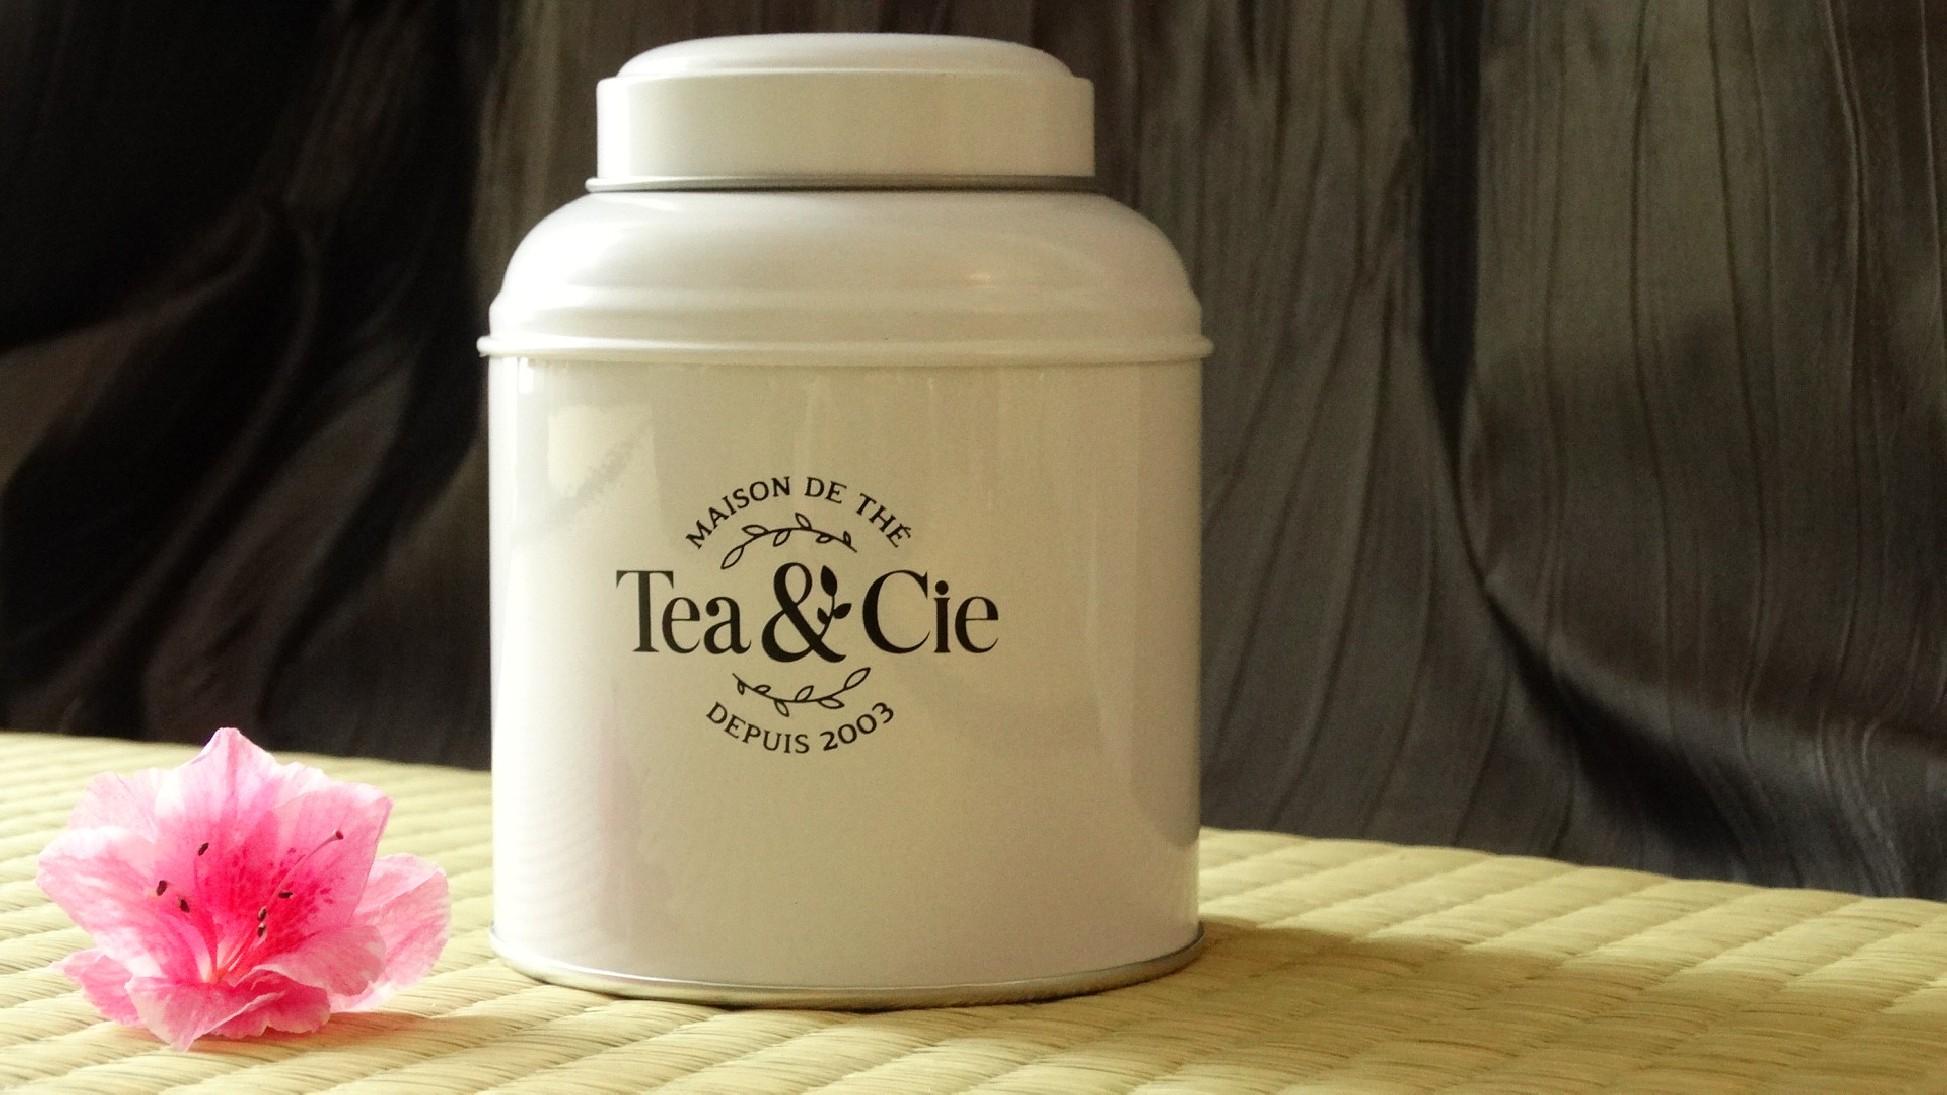 la petite boite jaune blanc Tea & cie www.teacie.com